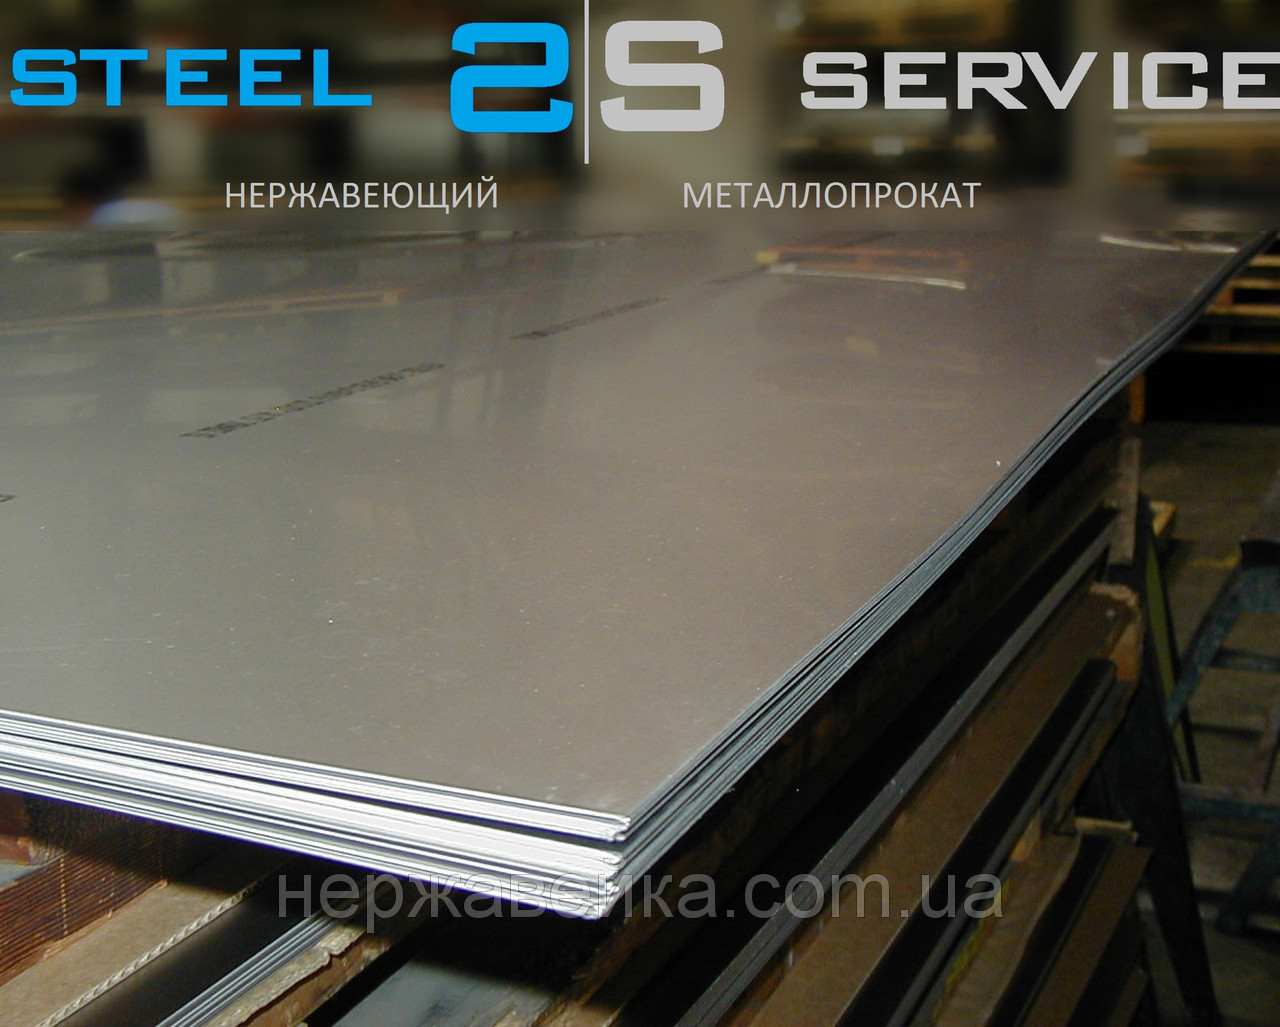 Нержавейка лист 0,5х1000х2000мм AISI 316Ti(10Х17Н13М2Т) 2B - матовый,  кислотостойкий